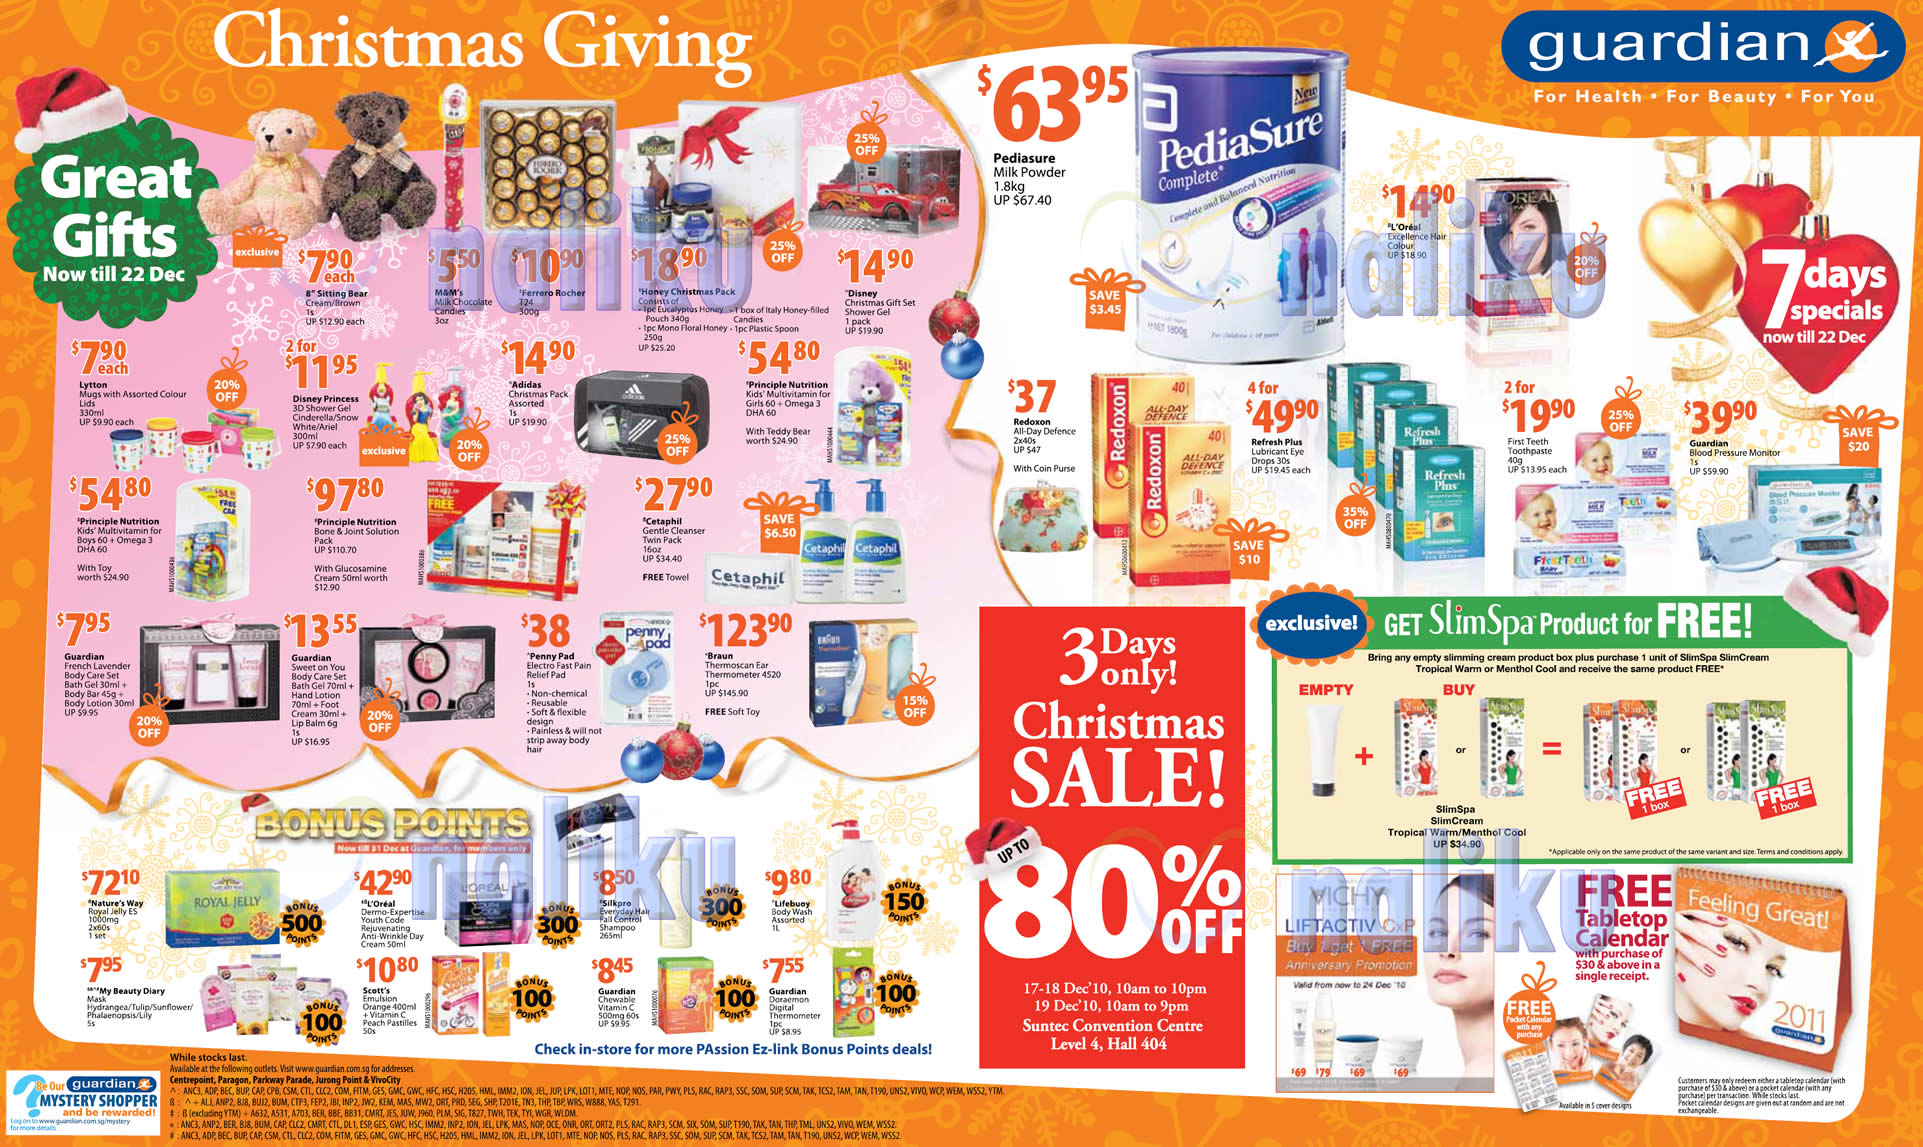 Guardian Singapore Health Amp Beauty Fair Sale